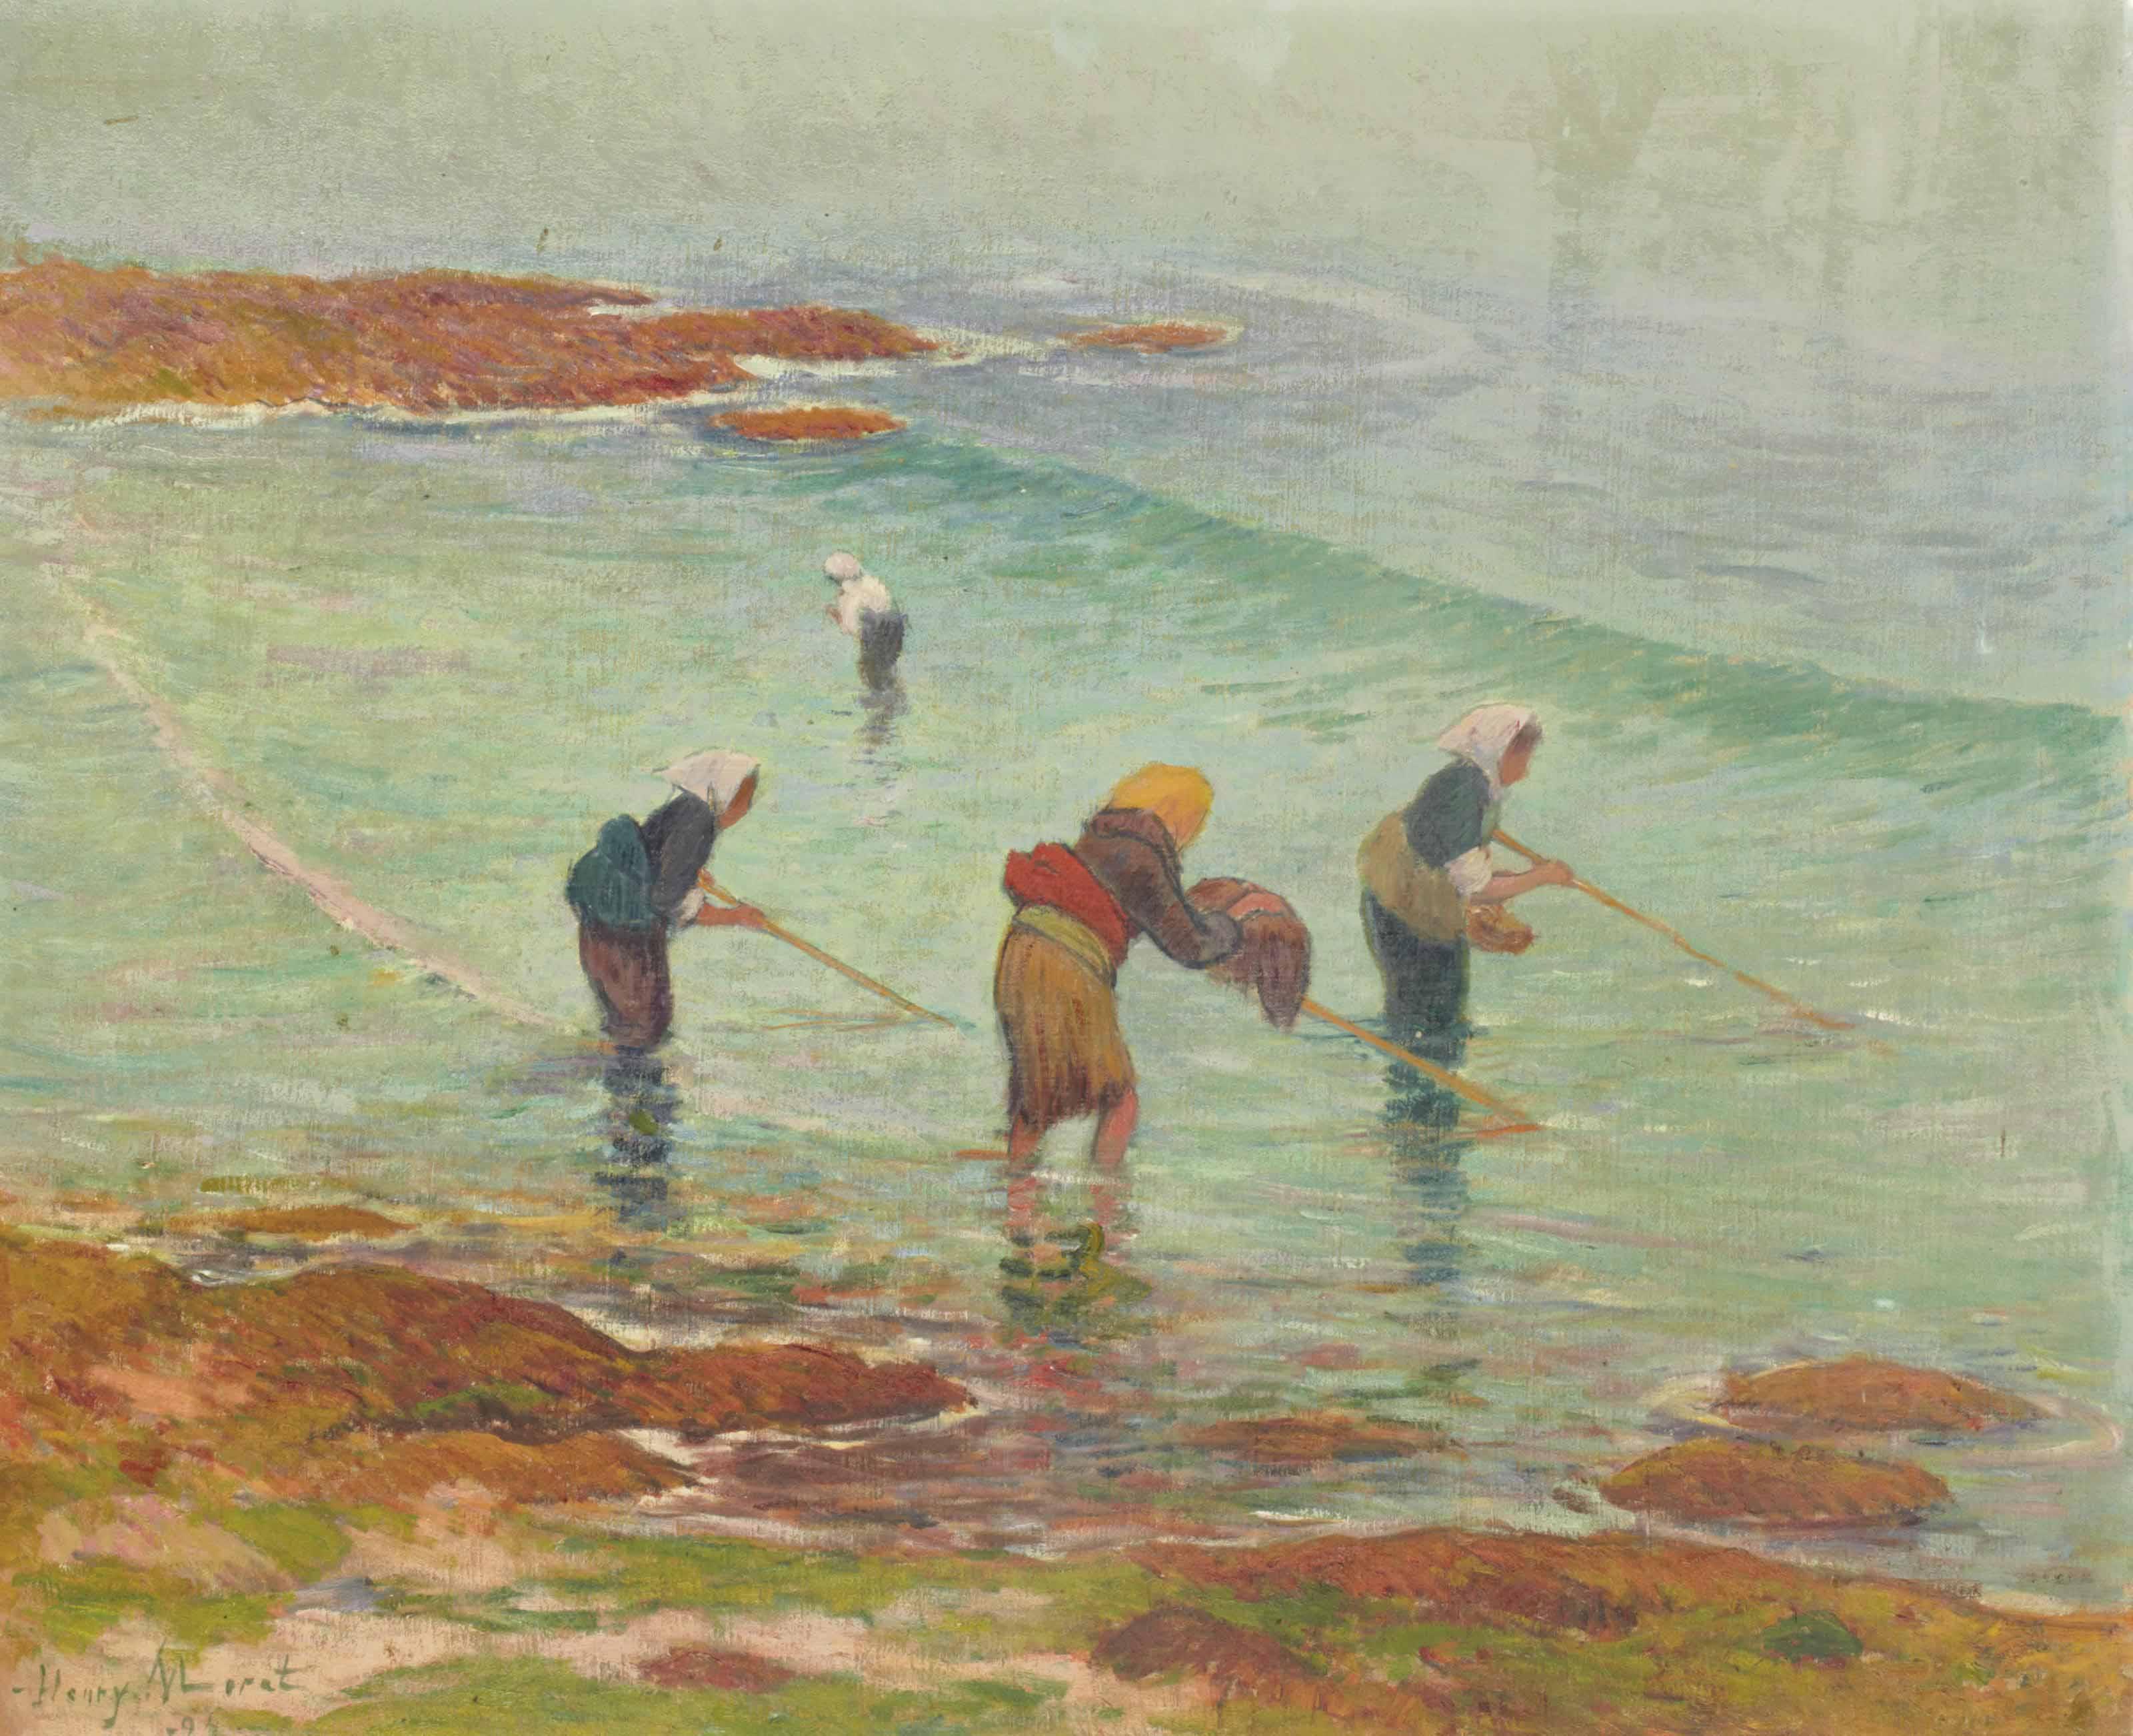 Les pêcheuses